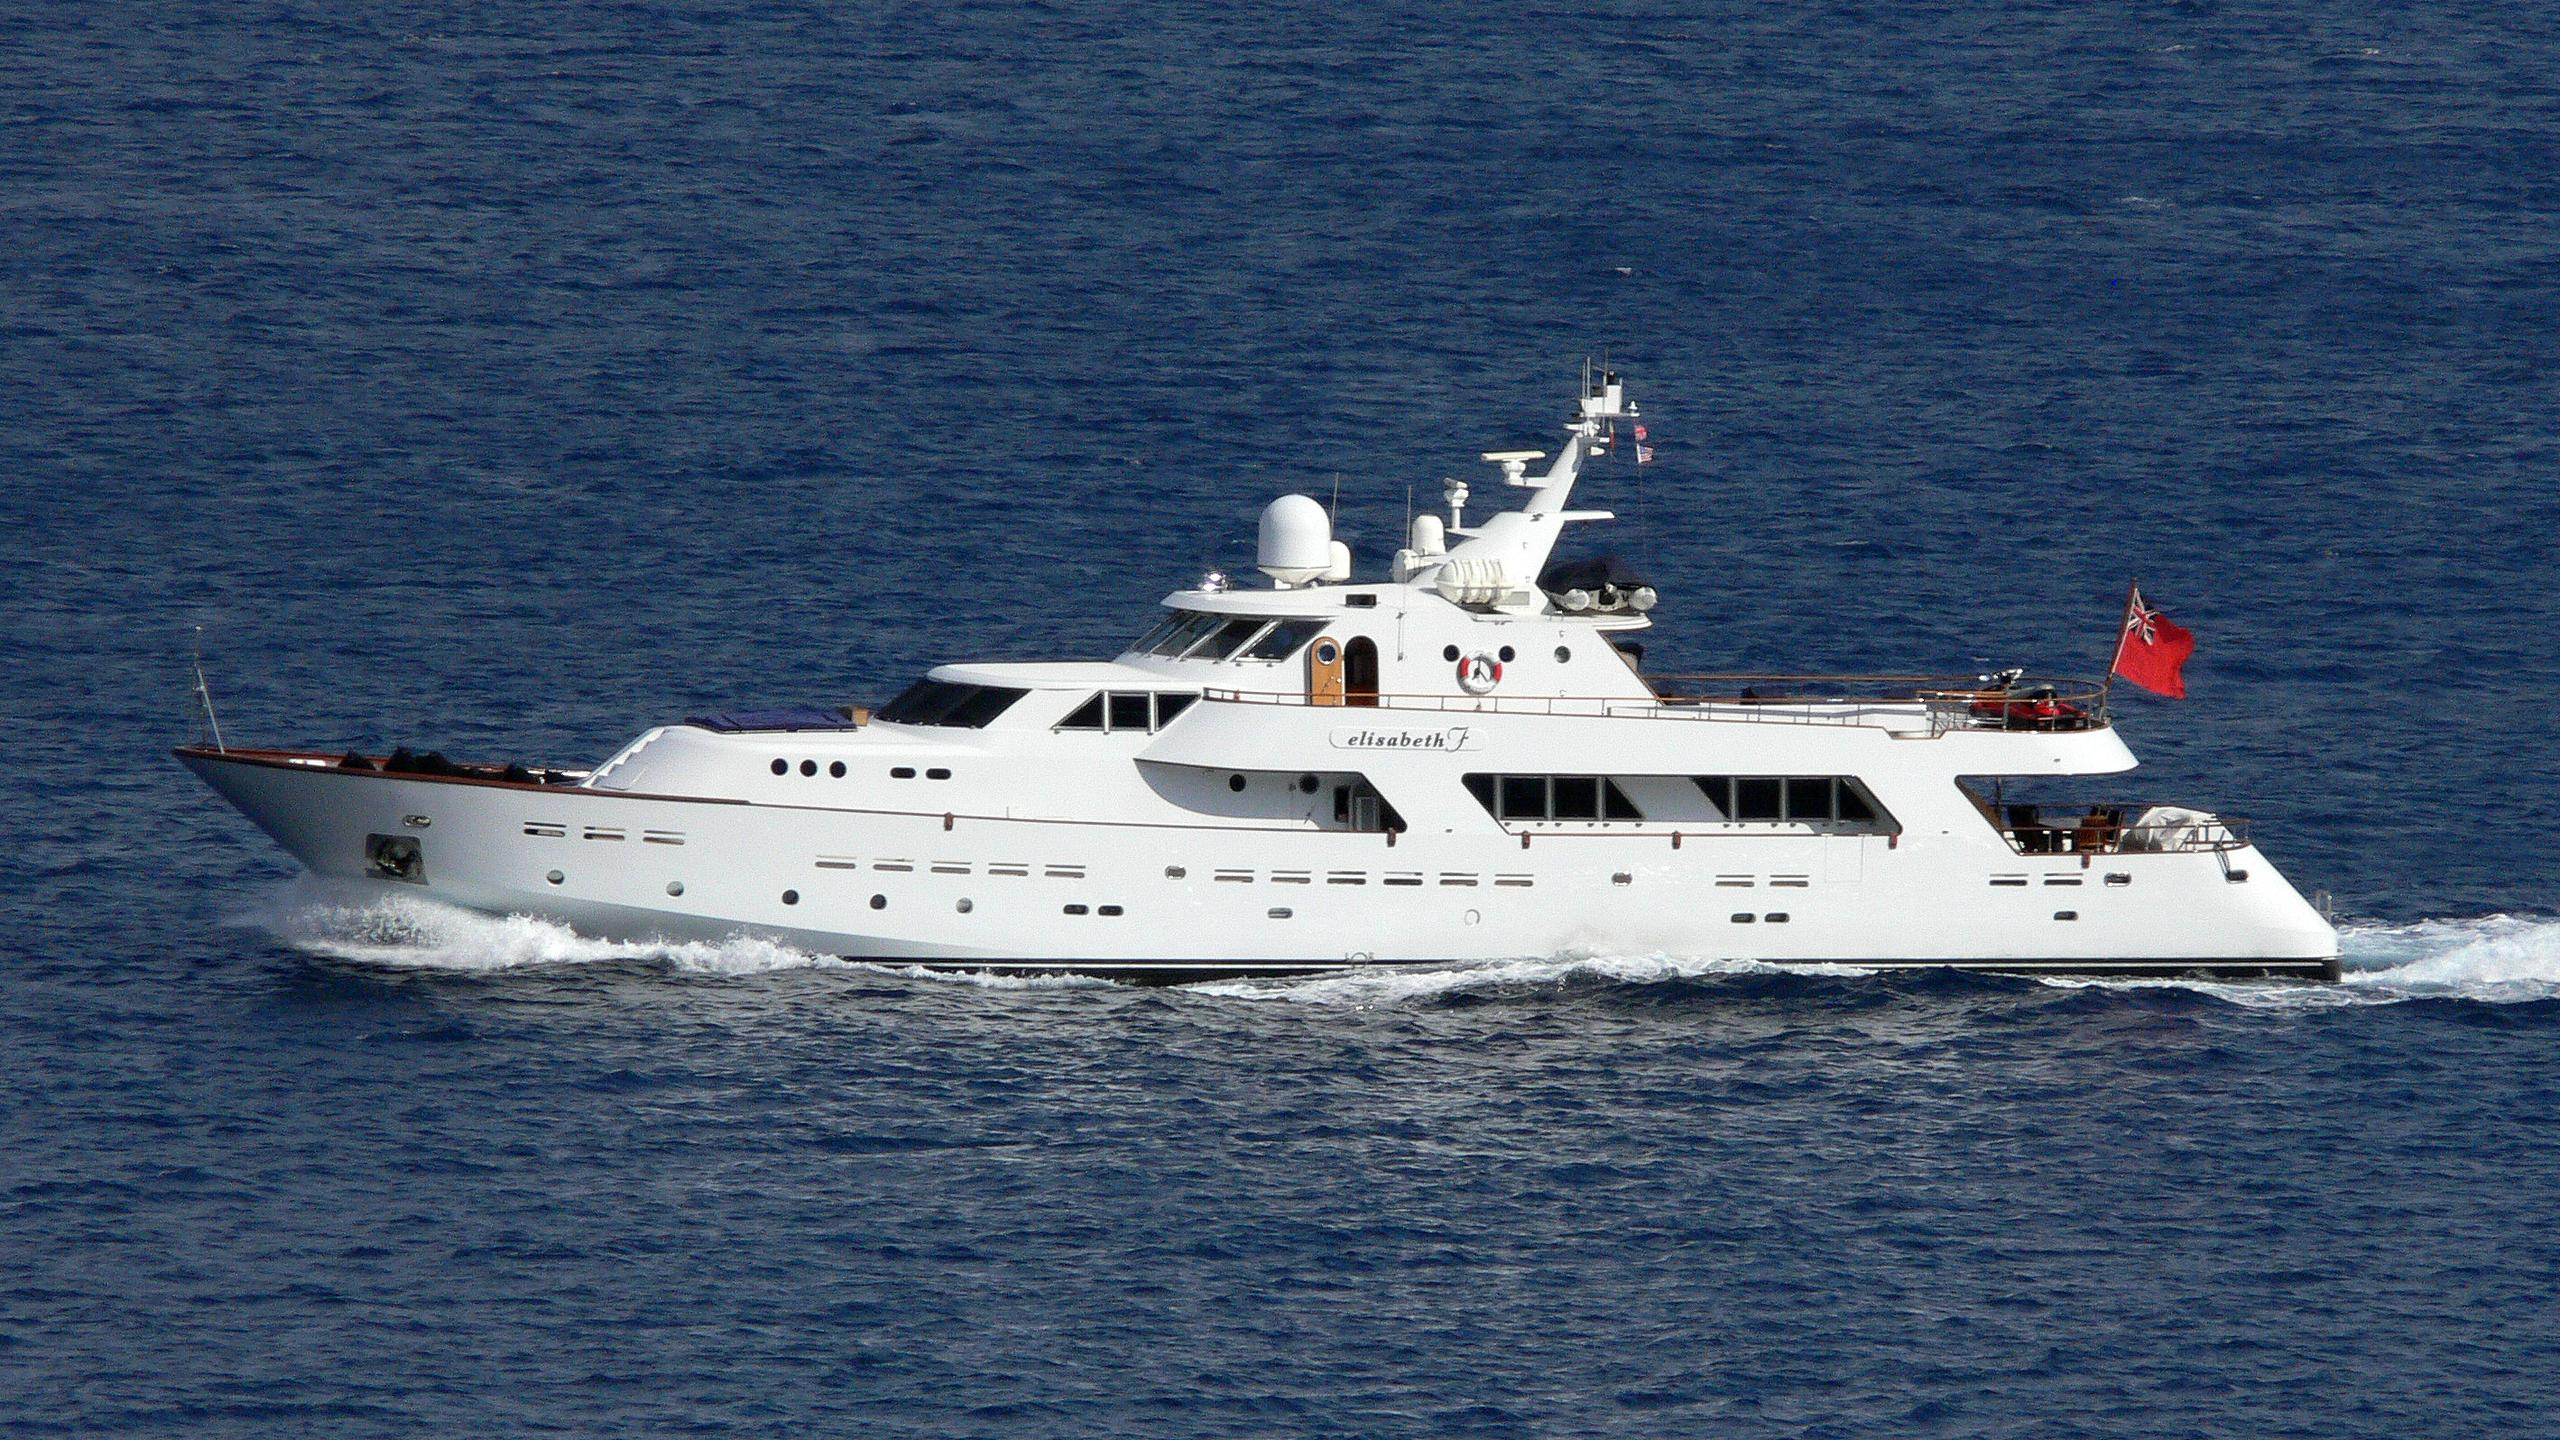 parvati-motor-yacht-crn-1979-38m-cruising